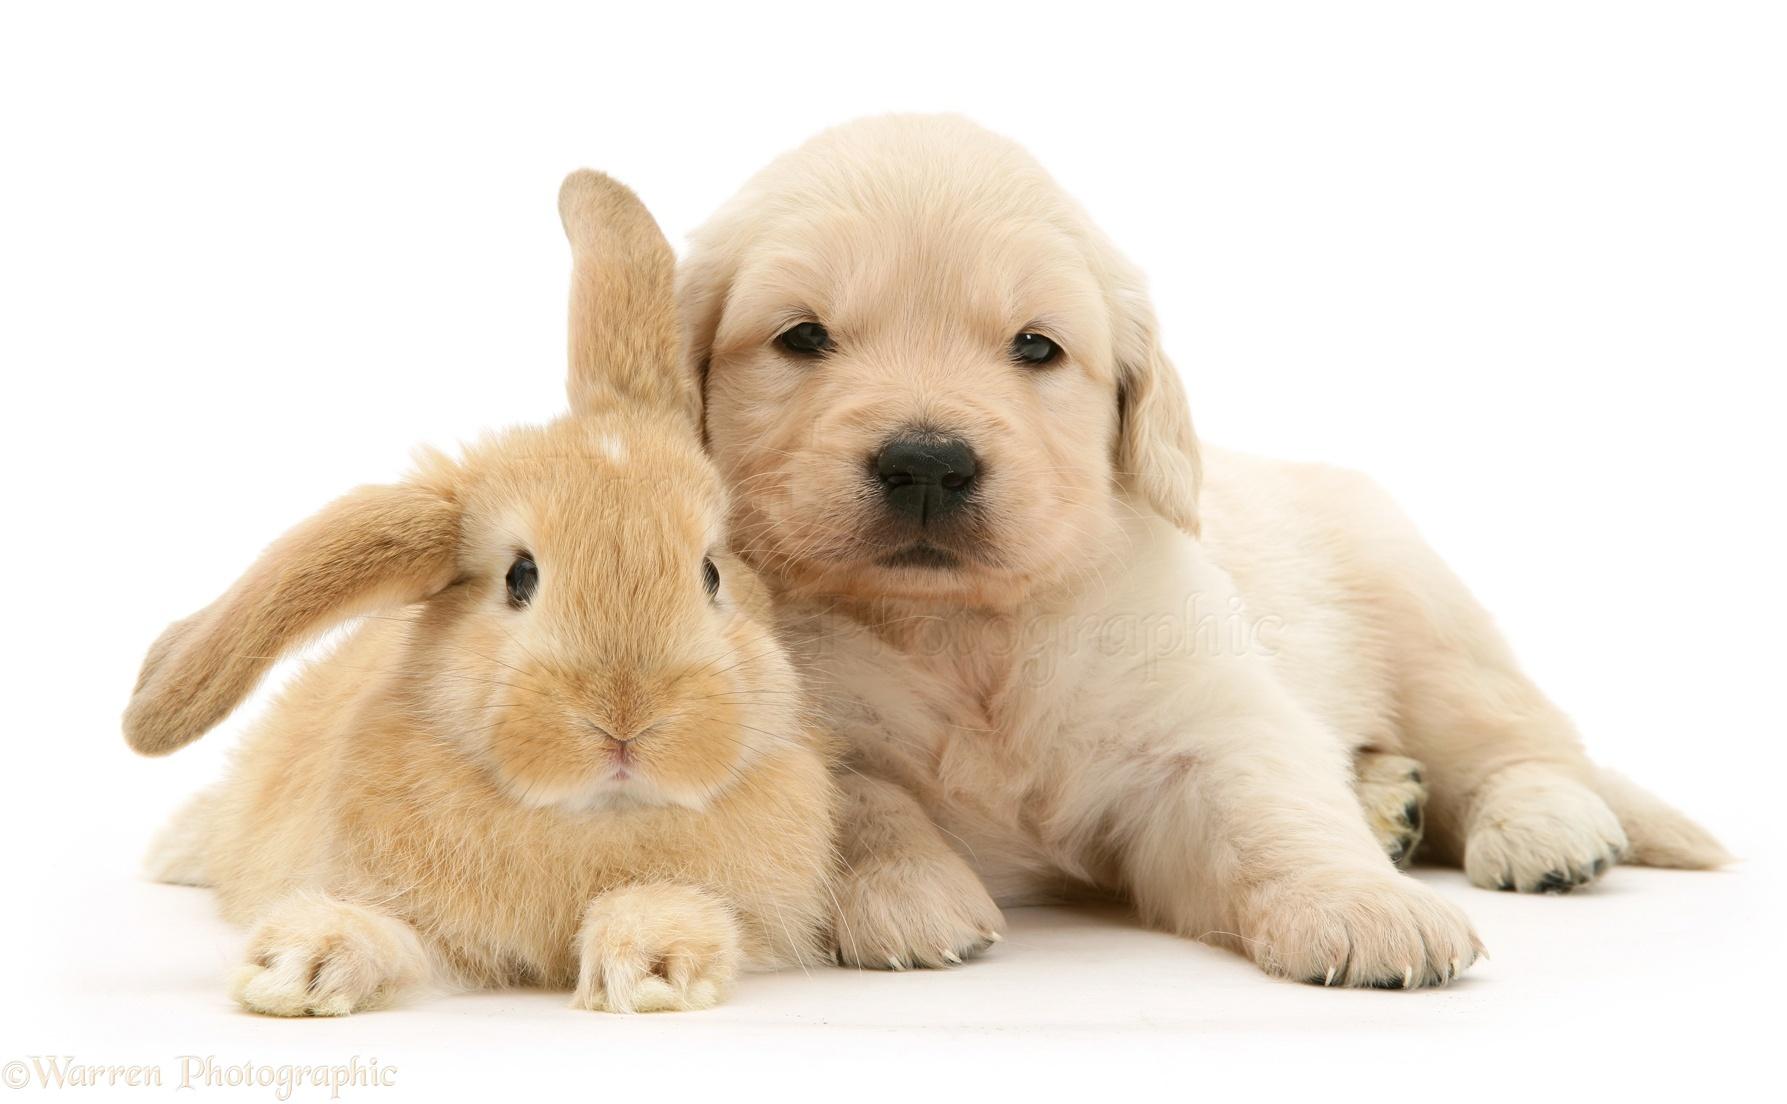 Pets Baby sandy Lop rabbit with Golden Retriever pup photo WP